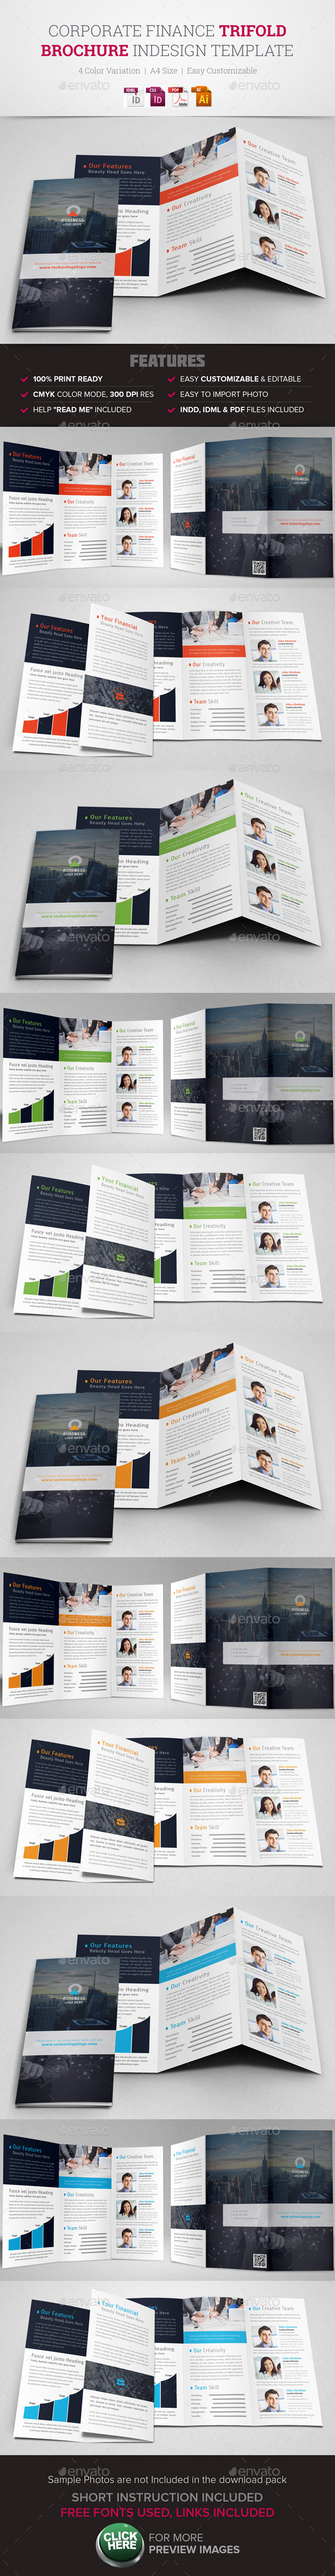 Corporate Finance Trifold Brochure InDesign - Corporate Brochures